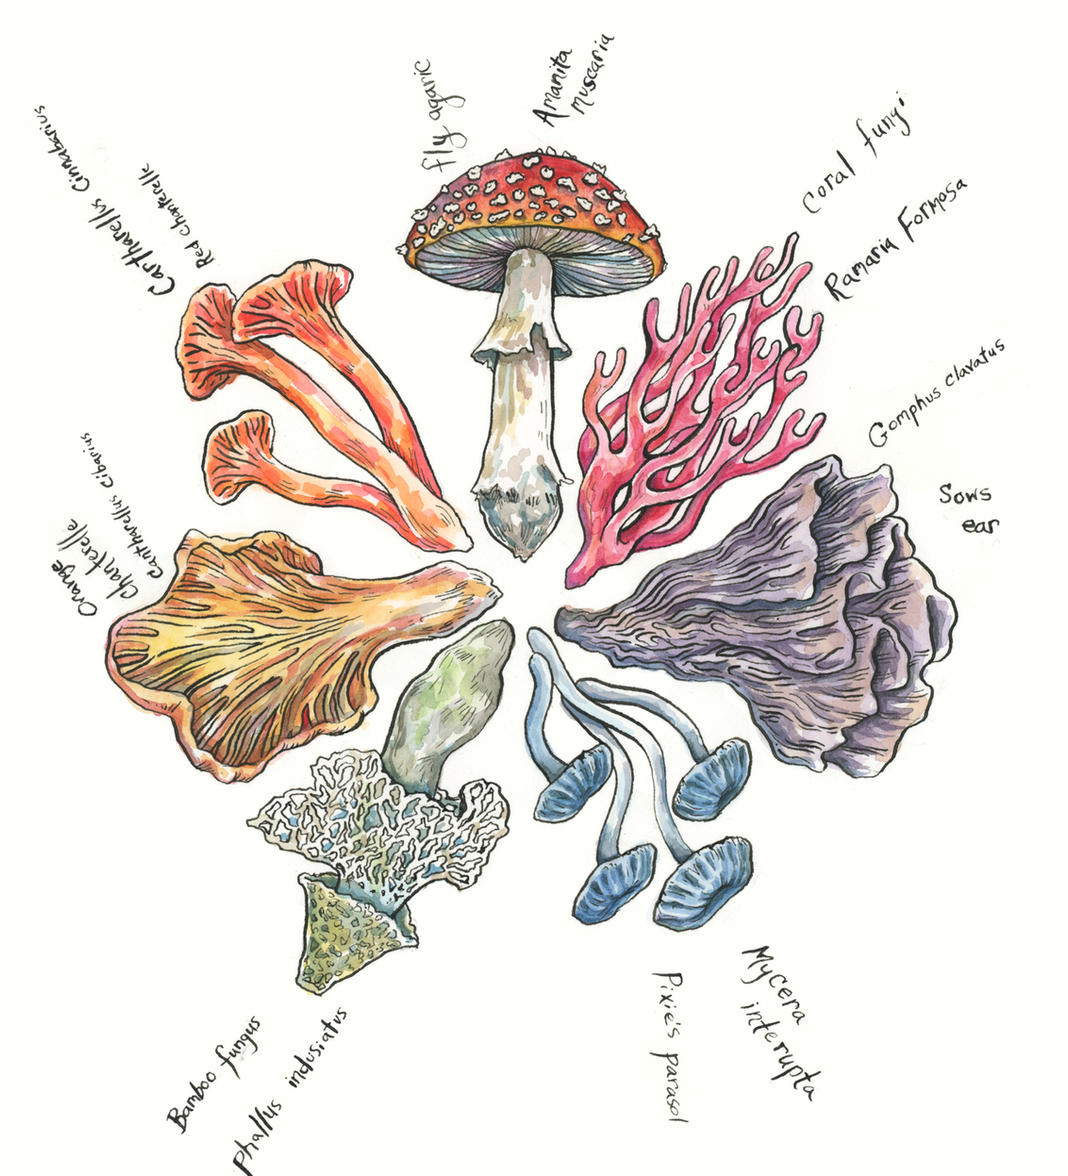 Mushroom Color Wheel, 2019